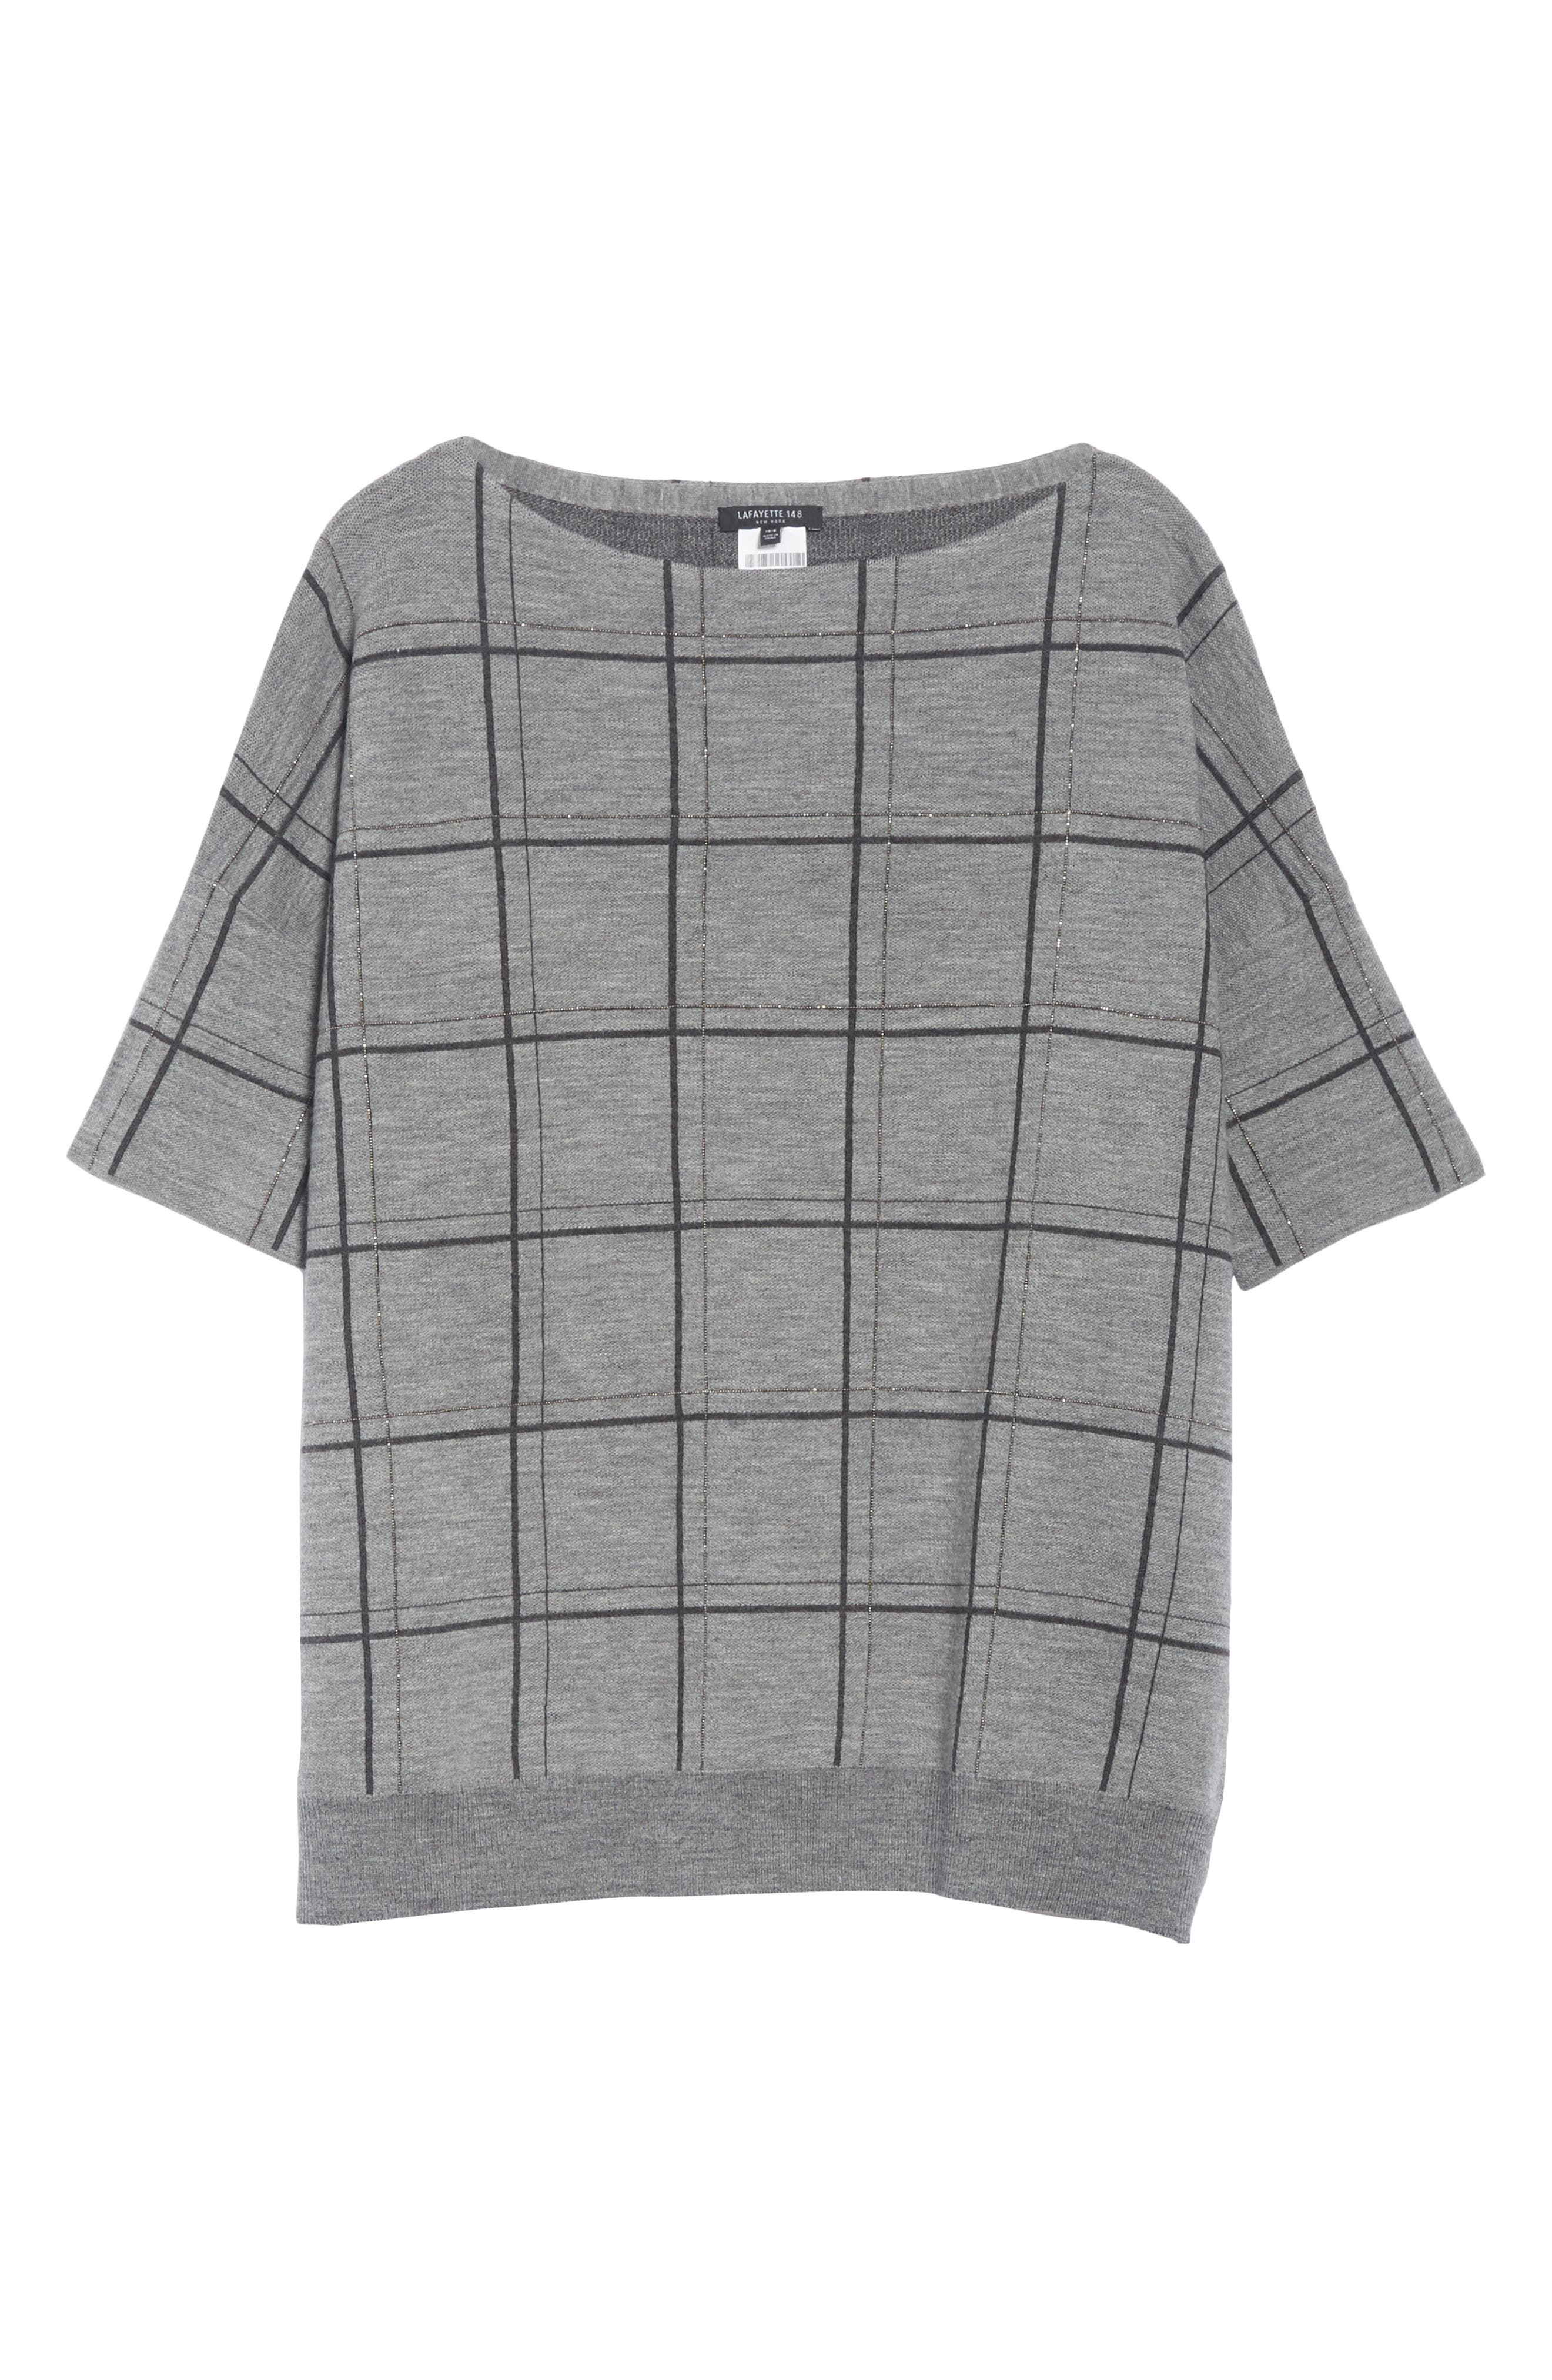 LAFAYETTE 148 NEW YORK,                             Chain Embellished Oversize Jacquard Sweater,                             Alternate thumbnail 6, color,                             056